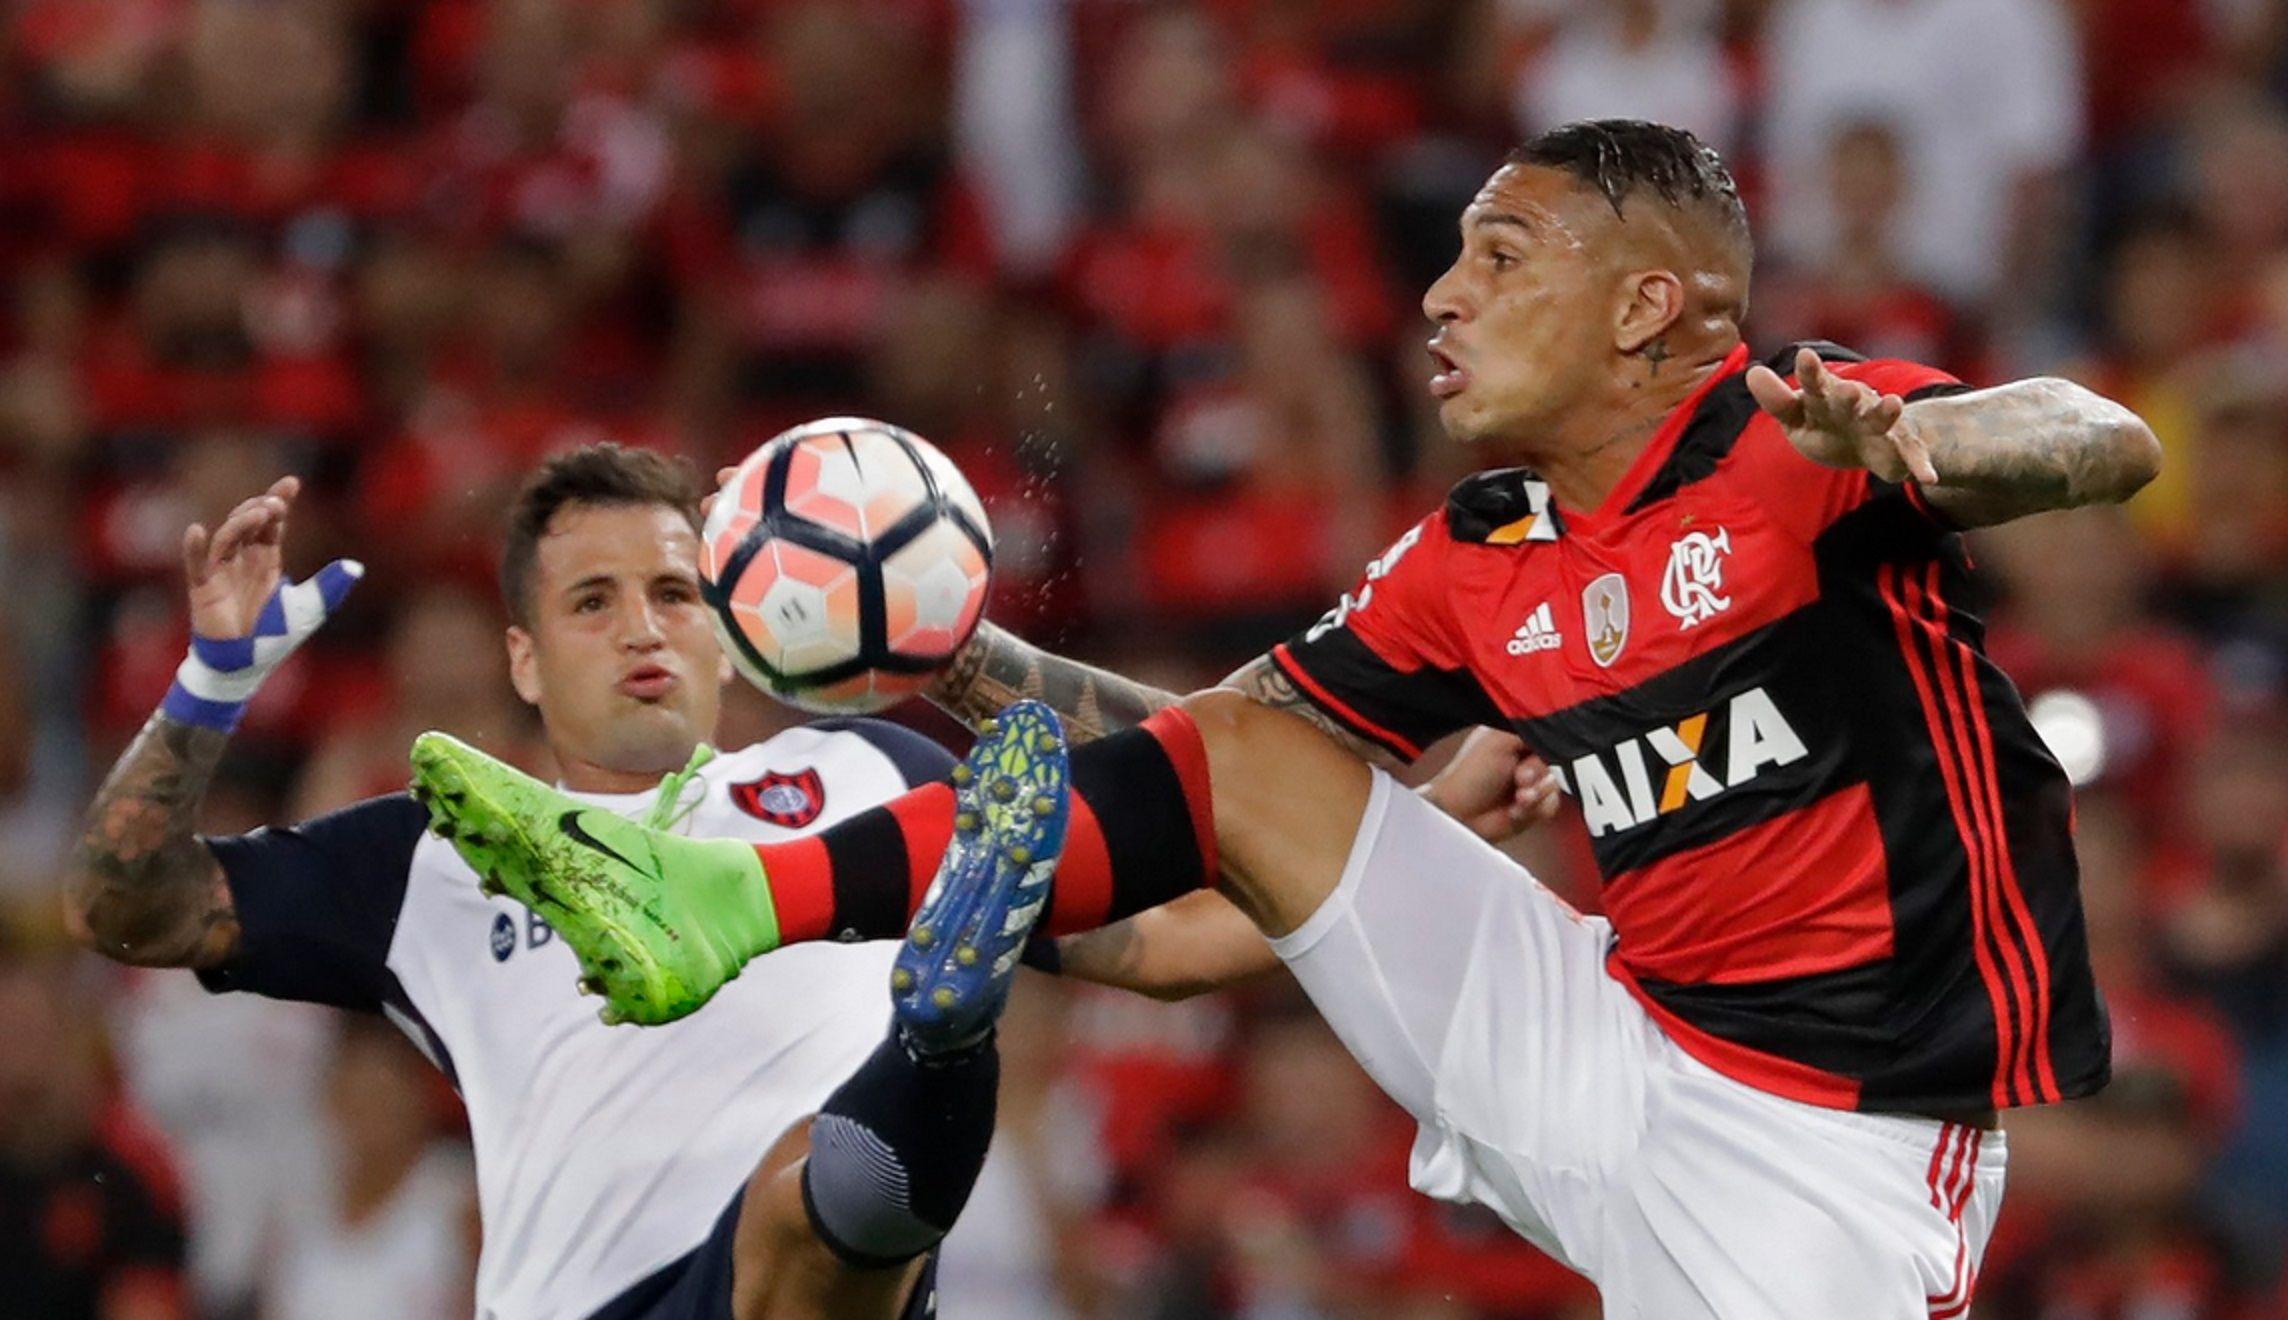 San Lorenzo visita a Flamengo